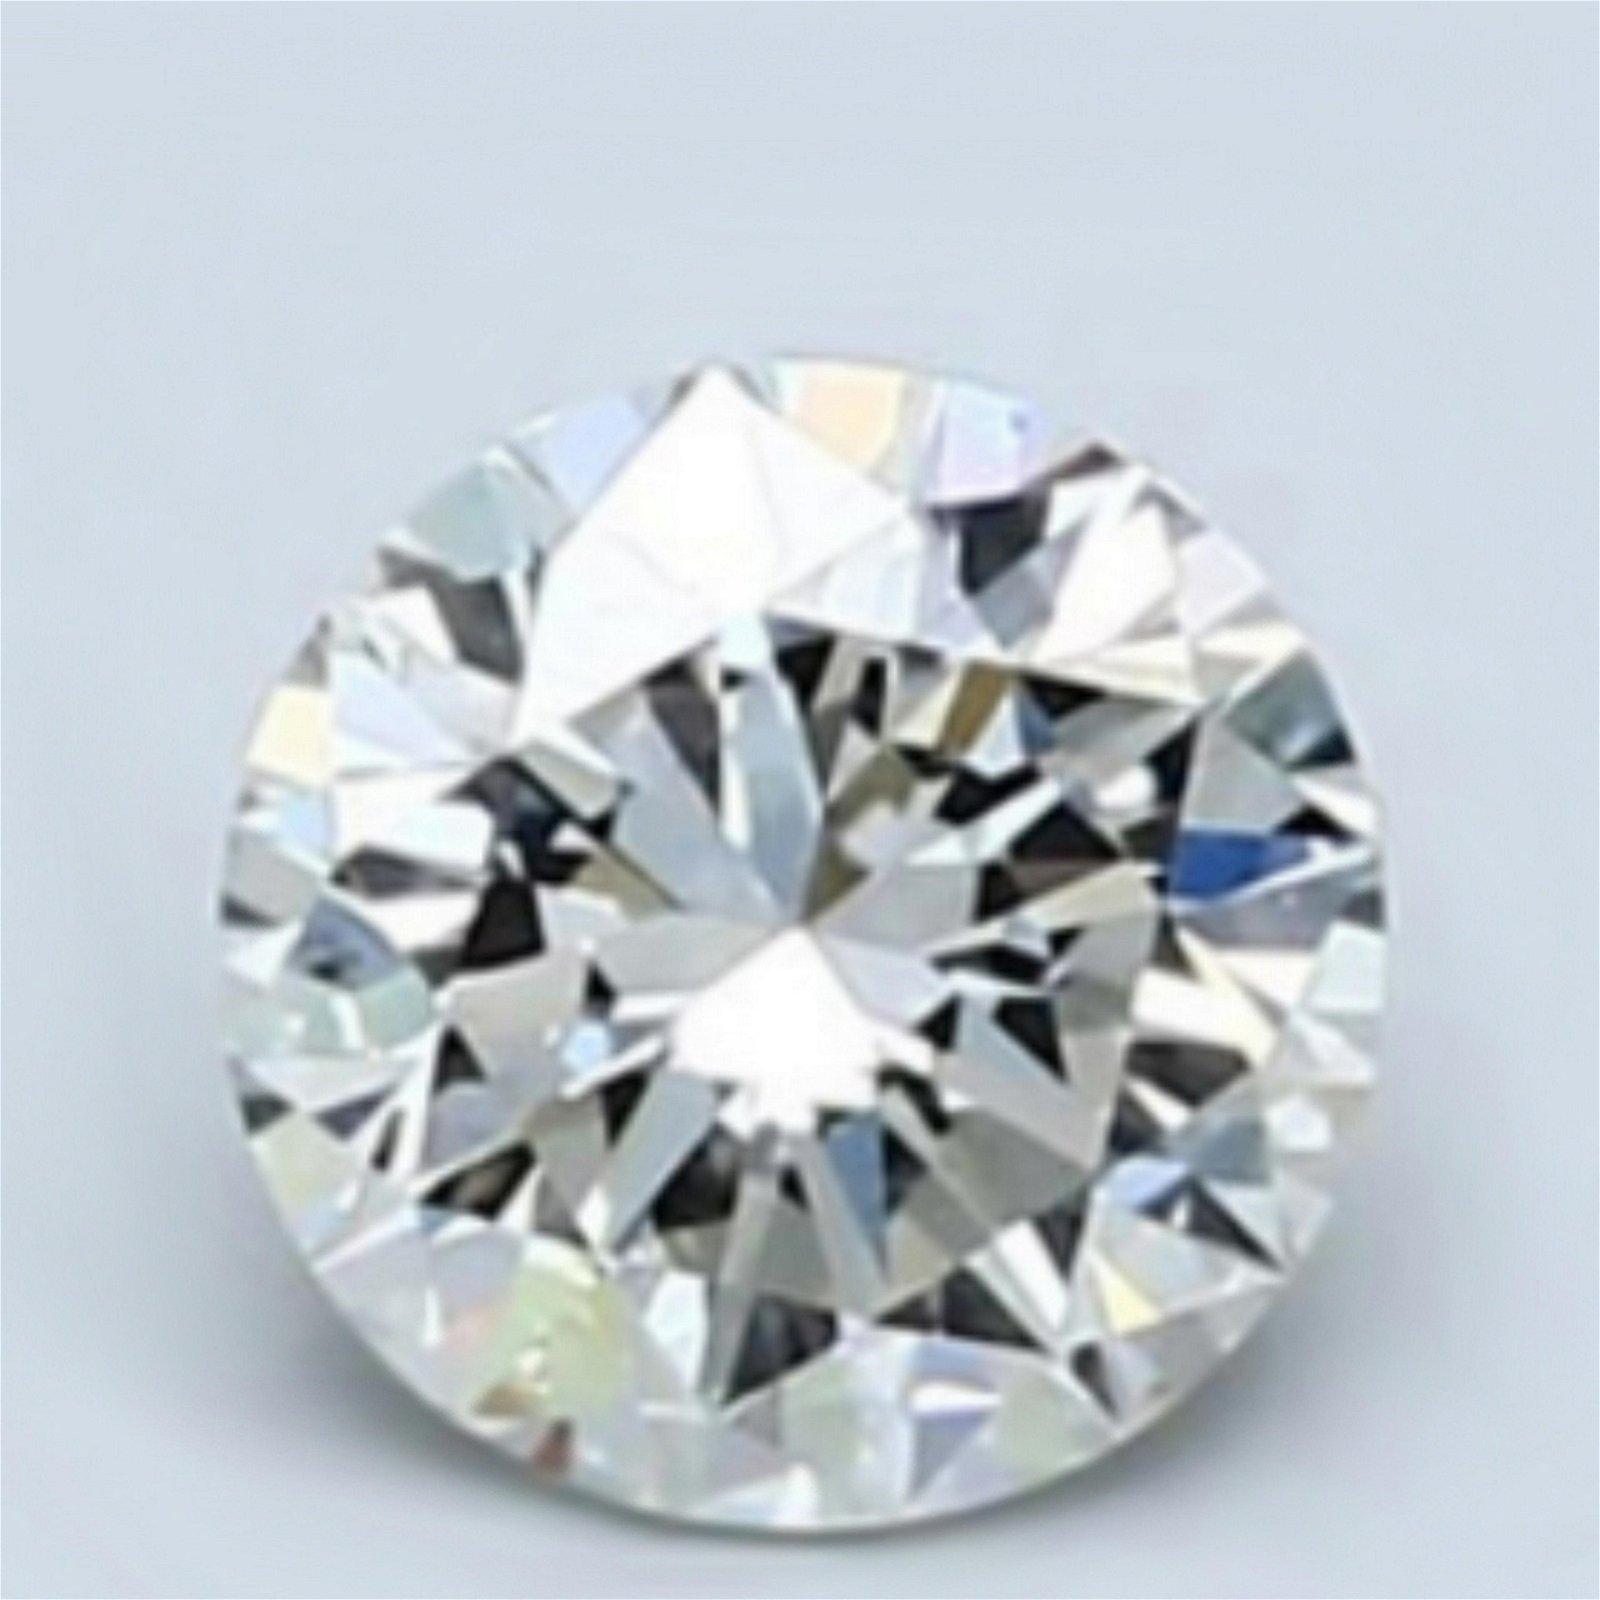 5.43 ct Loose Round Cut Diamond Color I VVS2 67% OFF